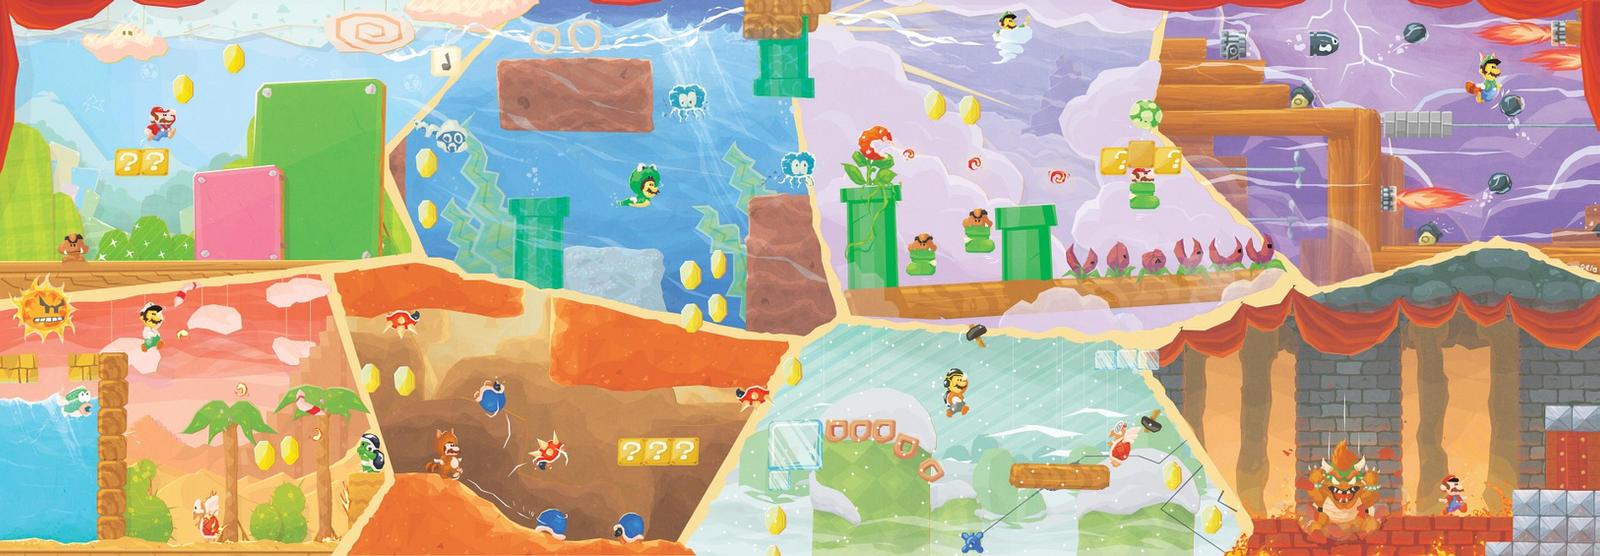 Super Mario Bros 3 Fresco by Orioto